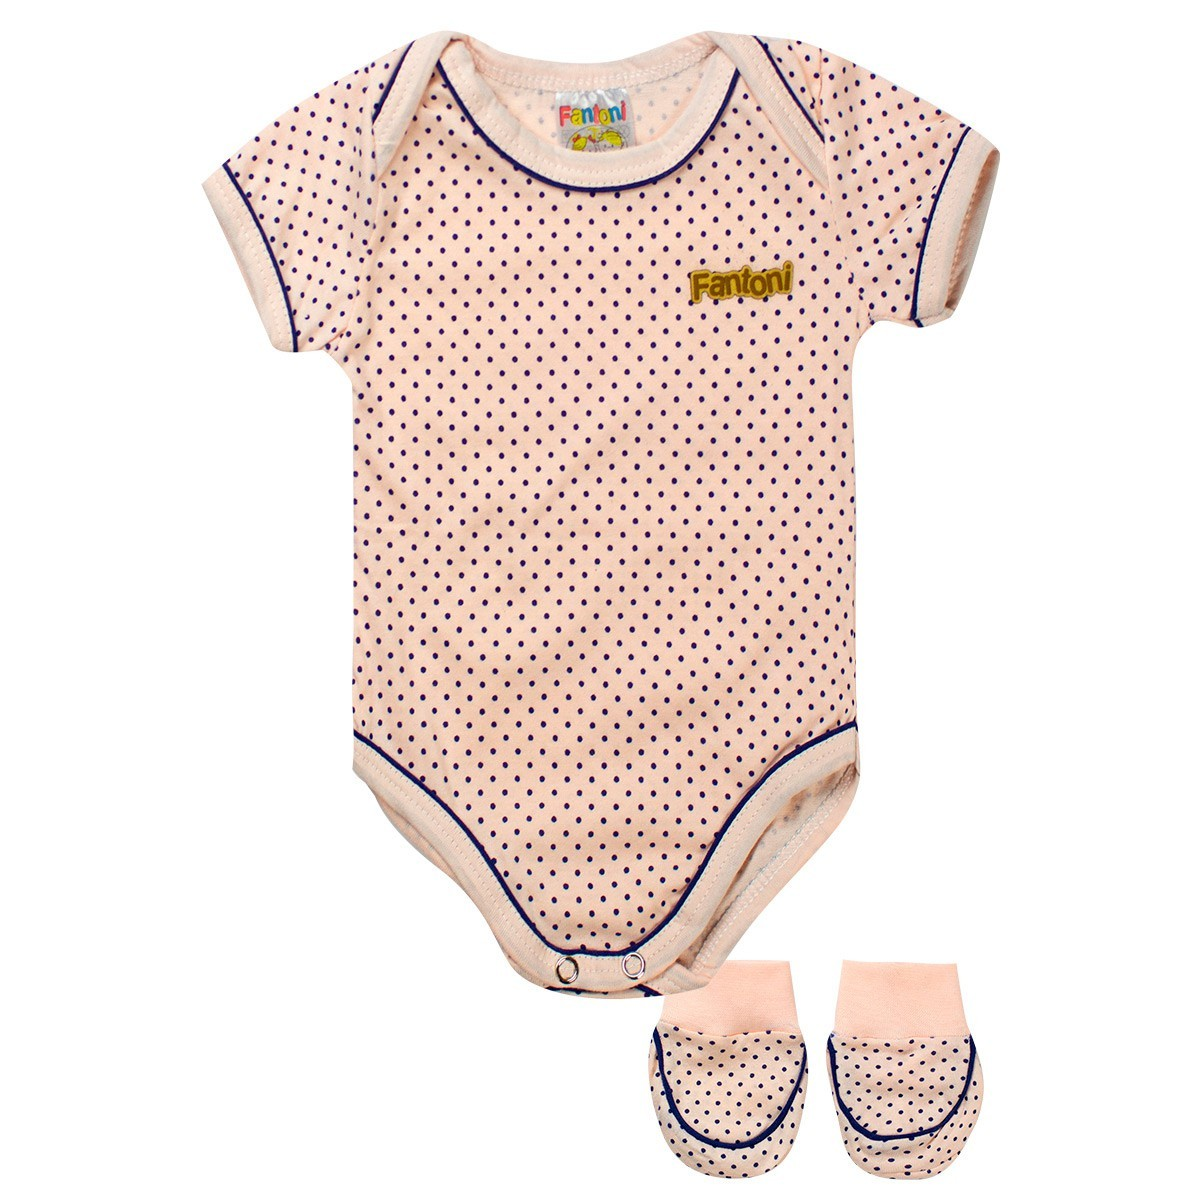 Body Infantil Bebê Menina Com Sapatinho Rosa - Fantoni